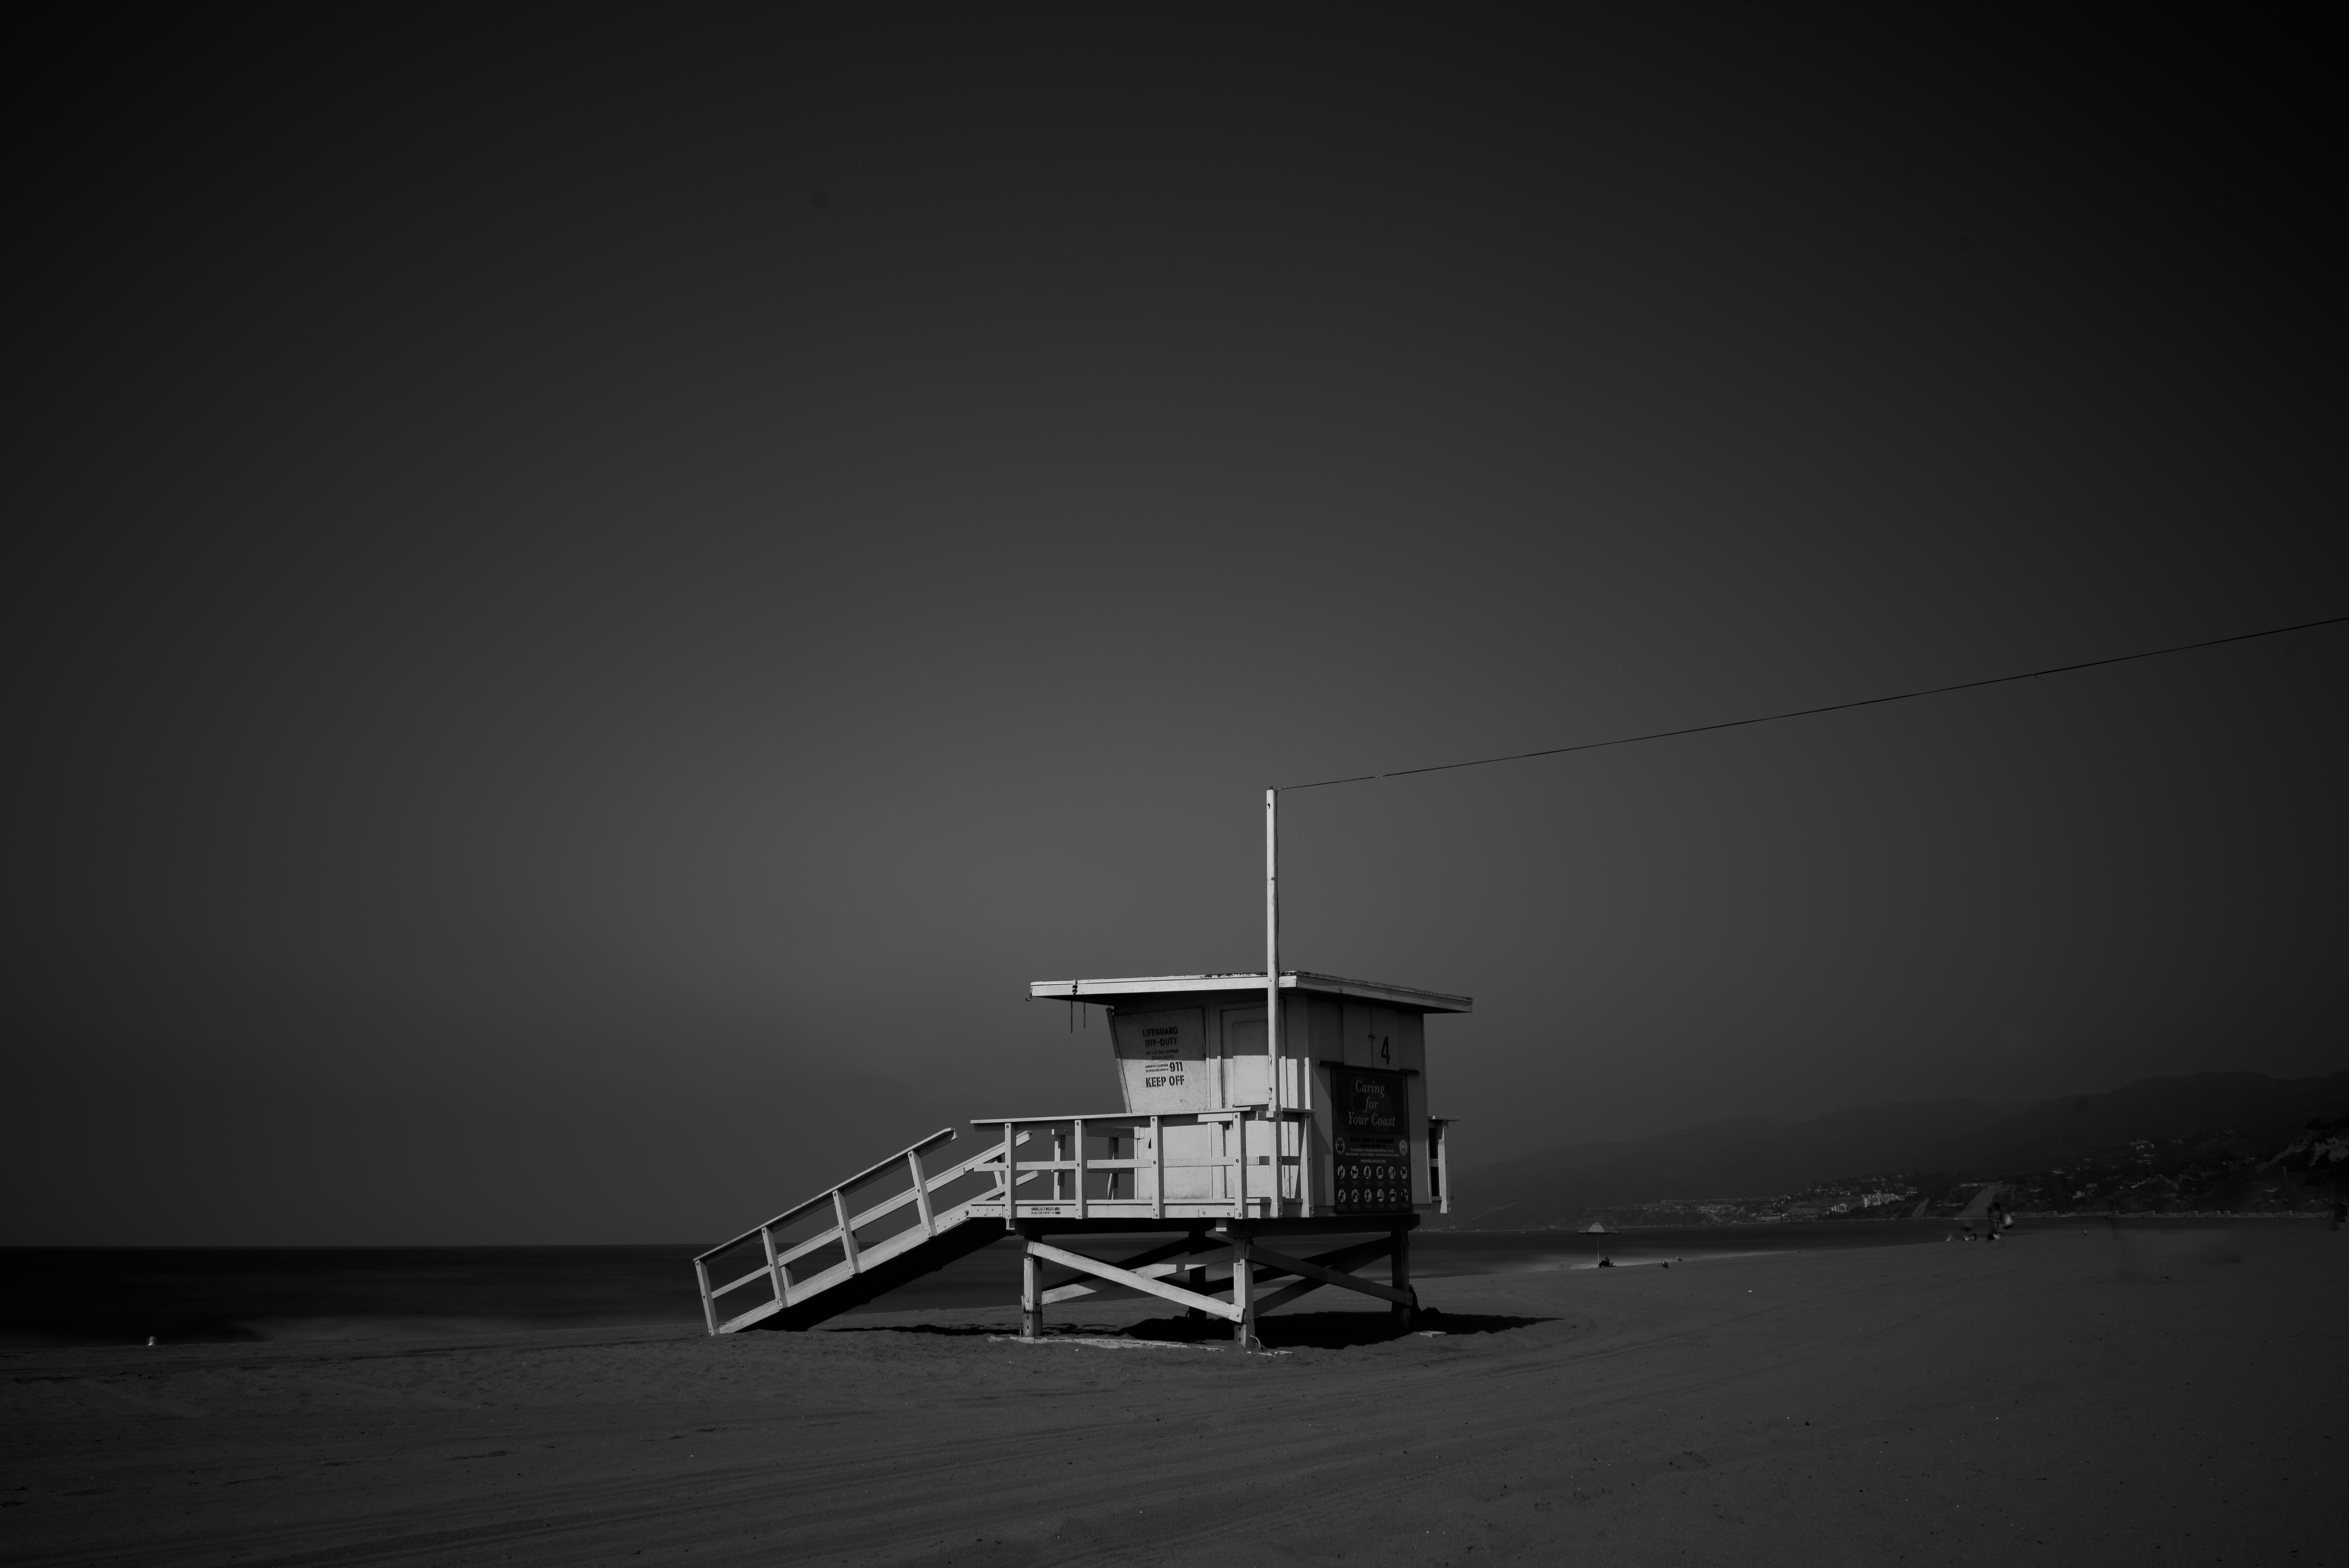 White Wooden Lifeguard House Near Shoreline